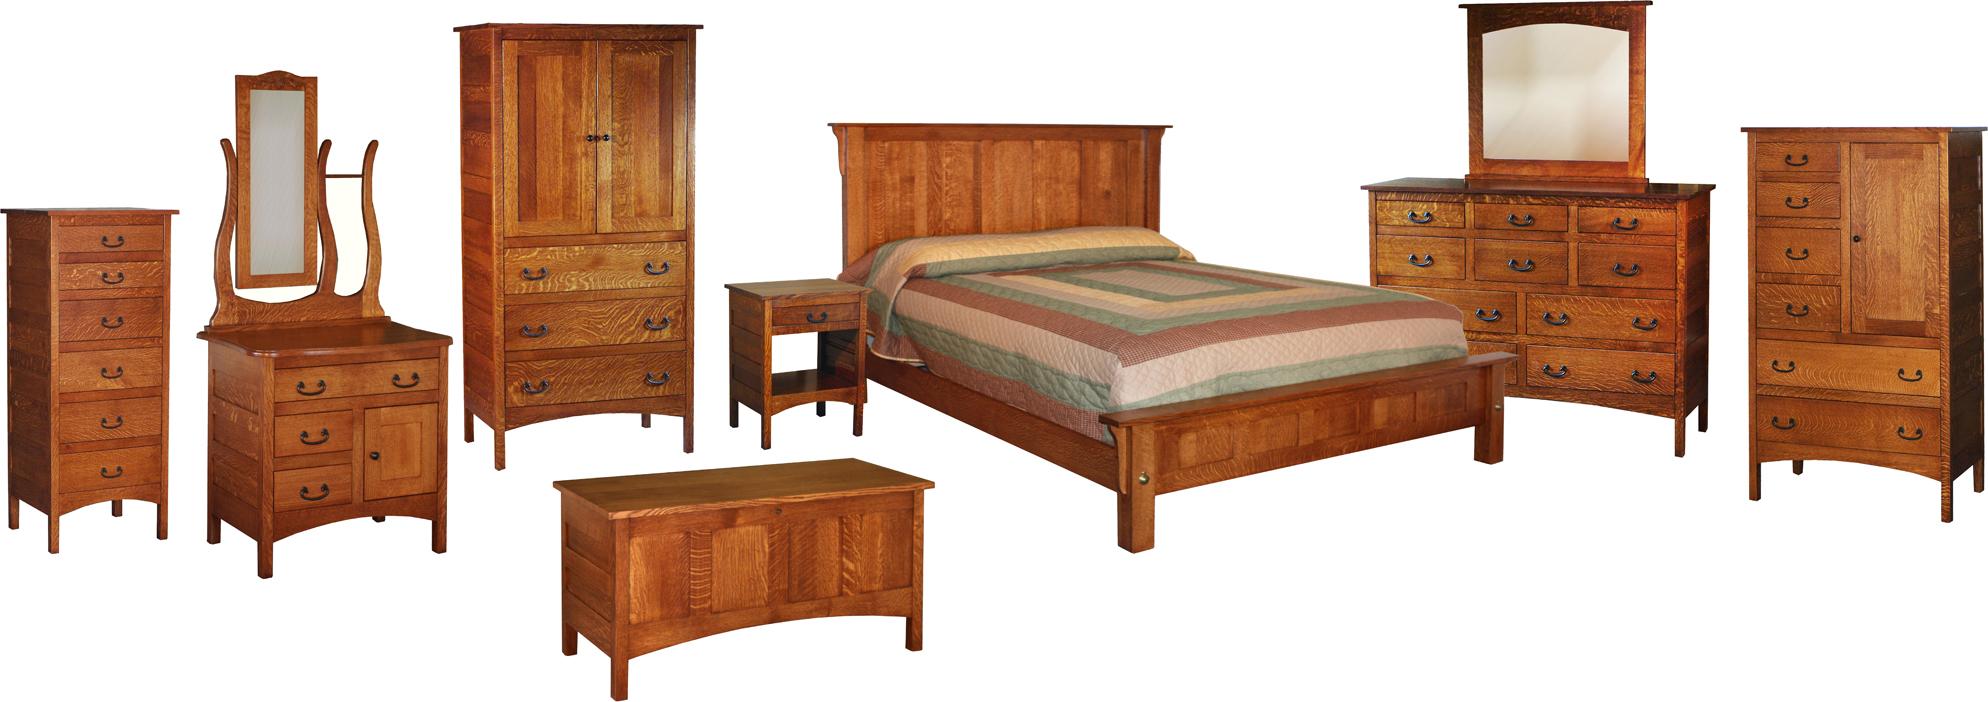 Bedroom sets amish bedroom collection brandenberry for Amish bedroom furniture